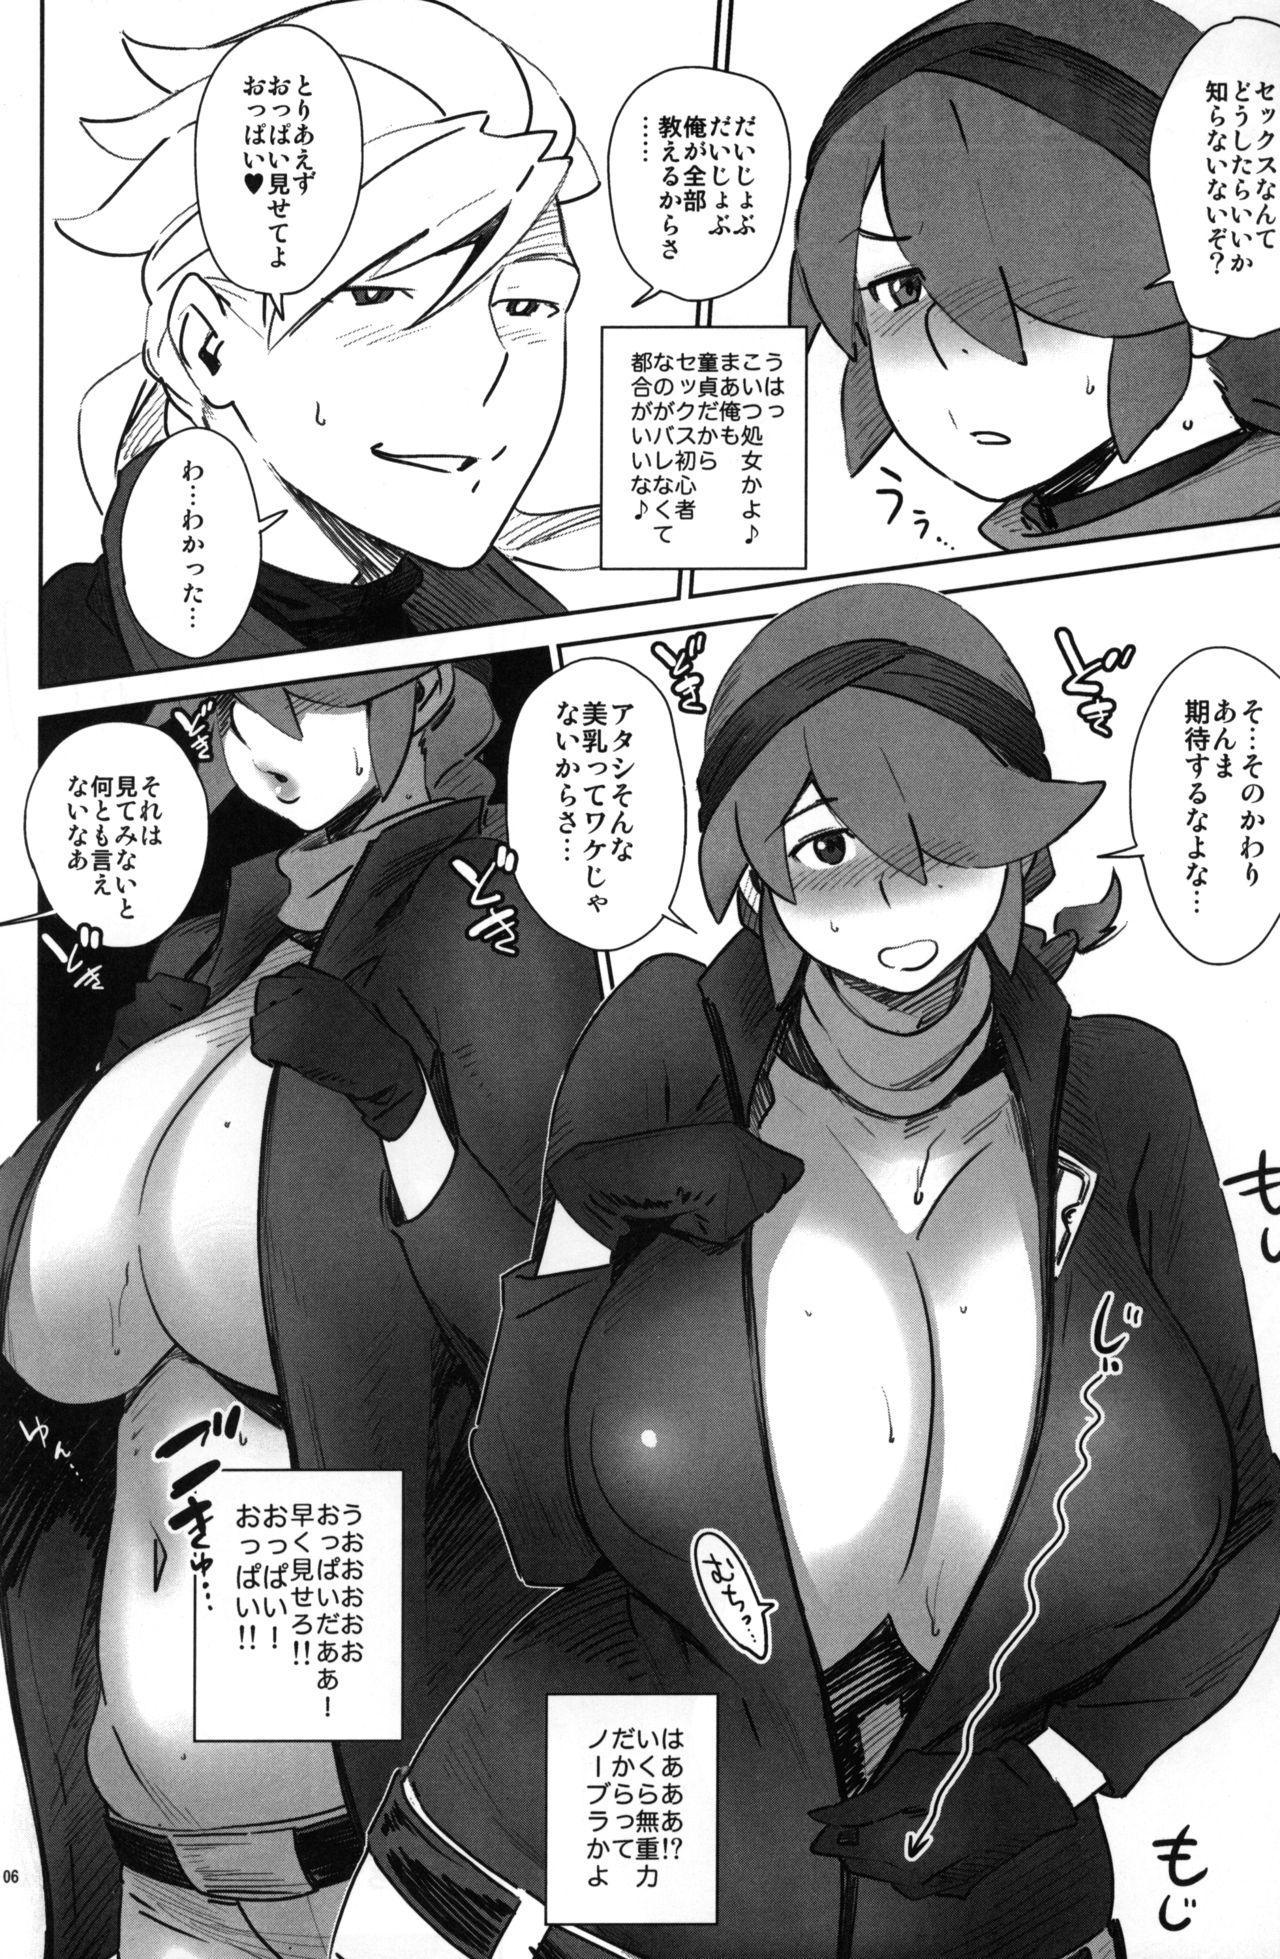 Abradeli Kamitaba No. 11 Otona no GundamAge 2 seX-rounder 4